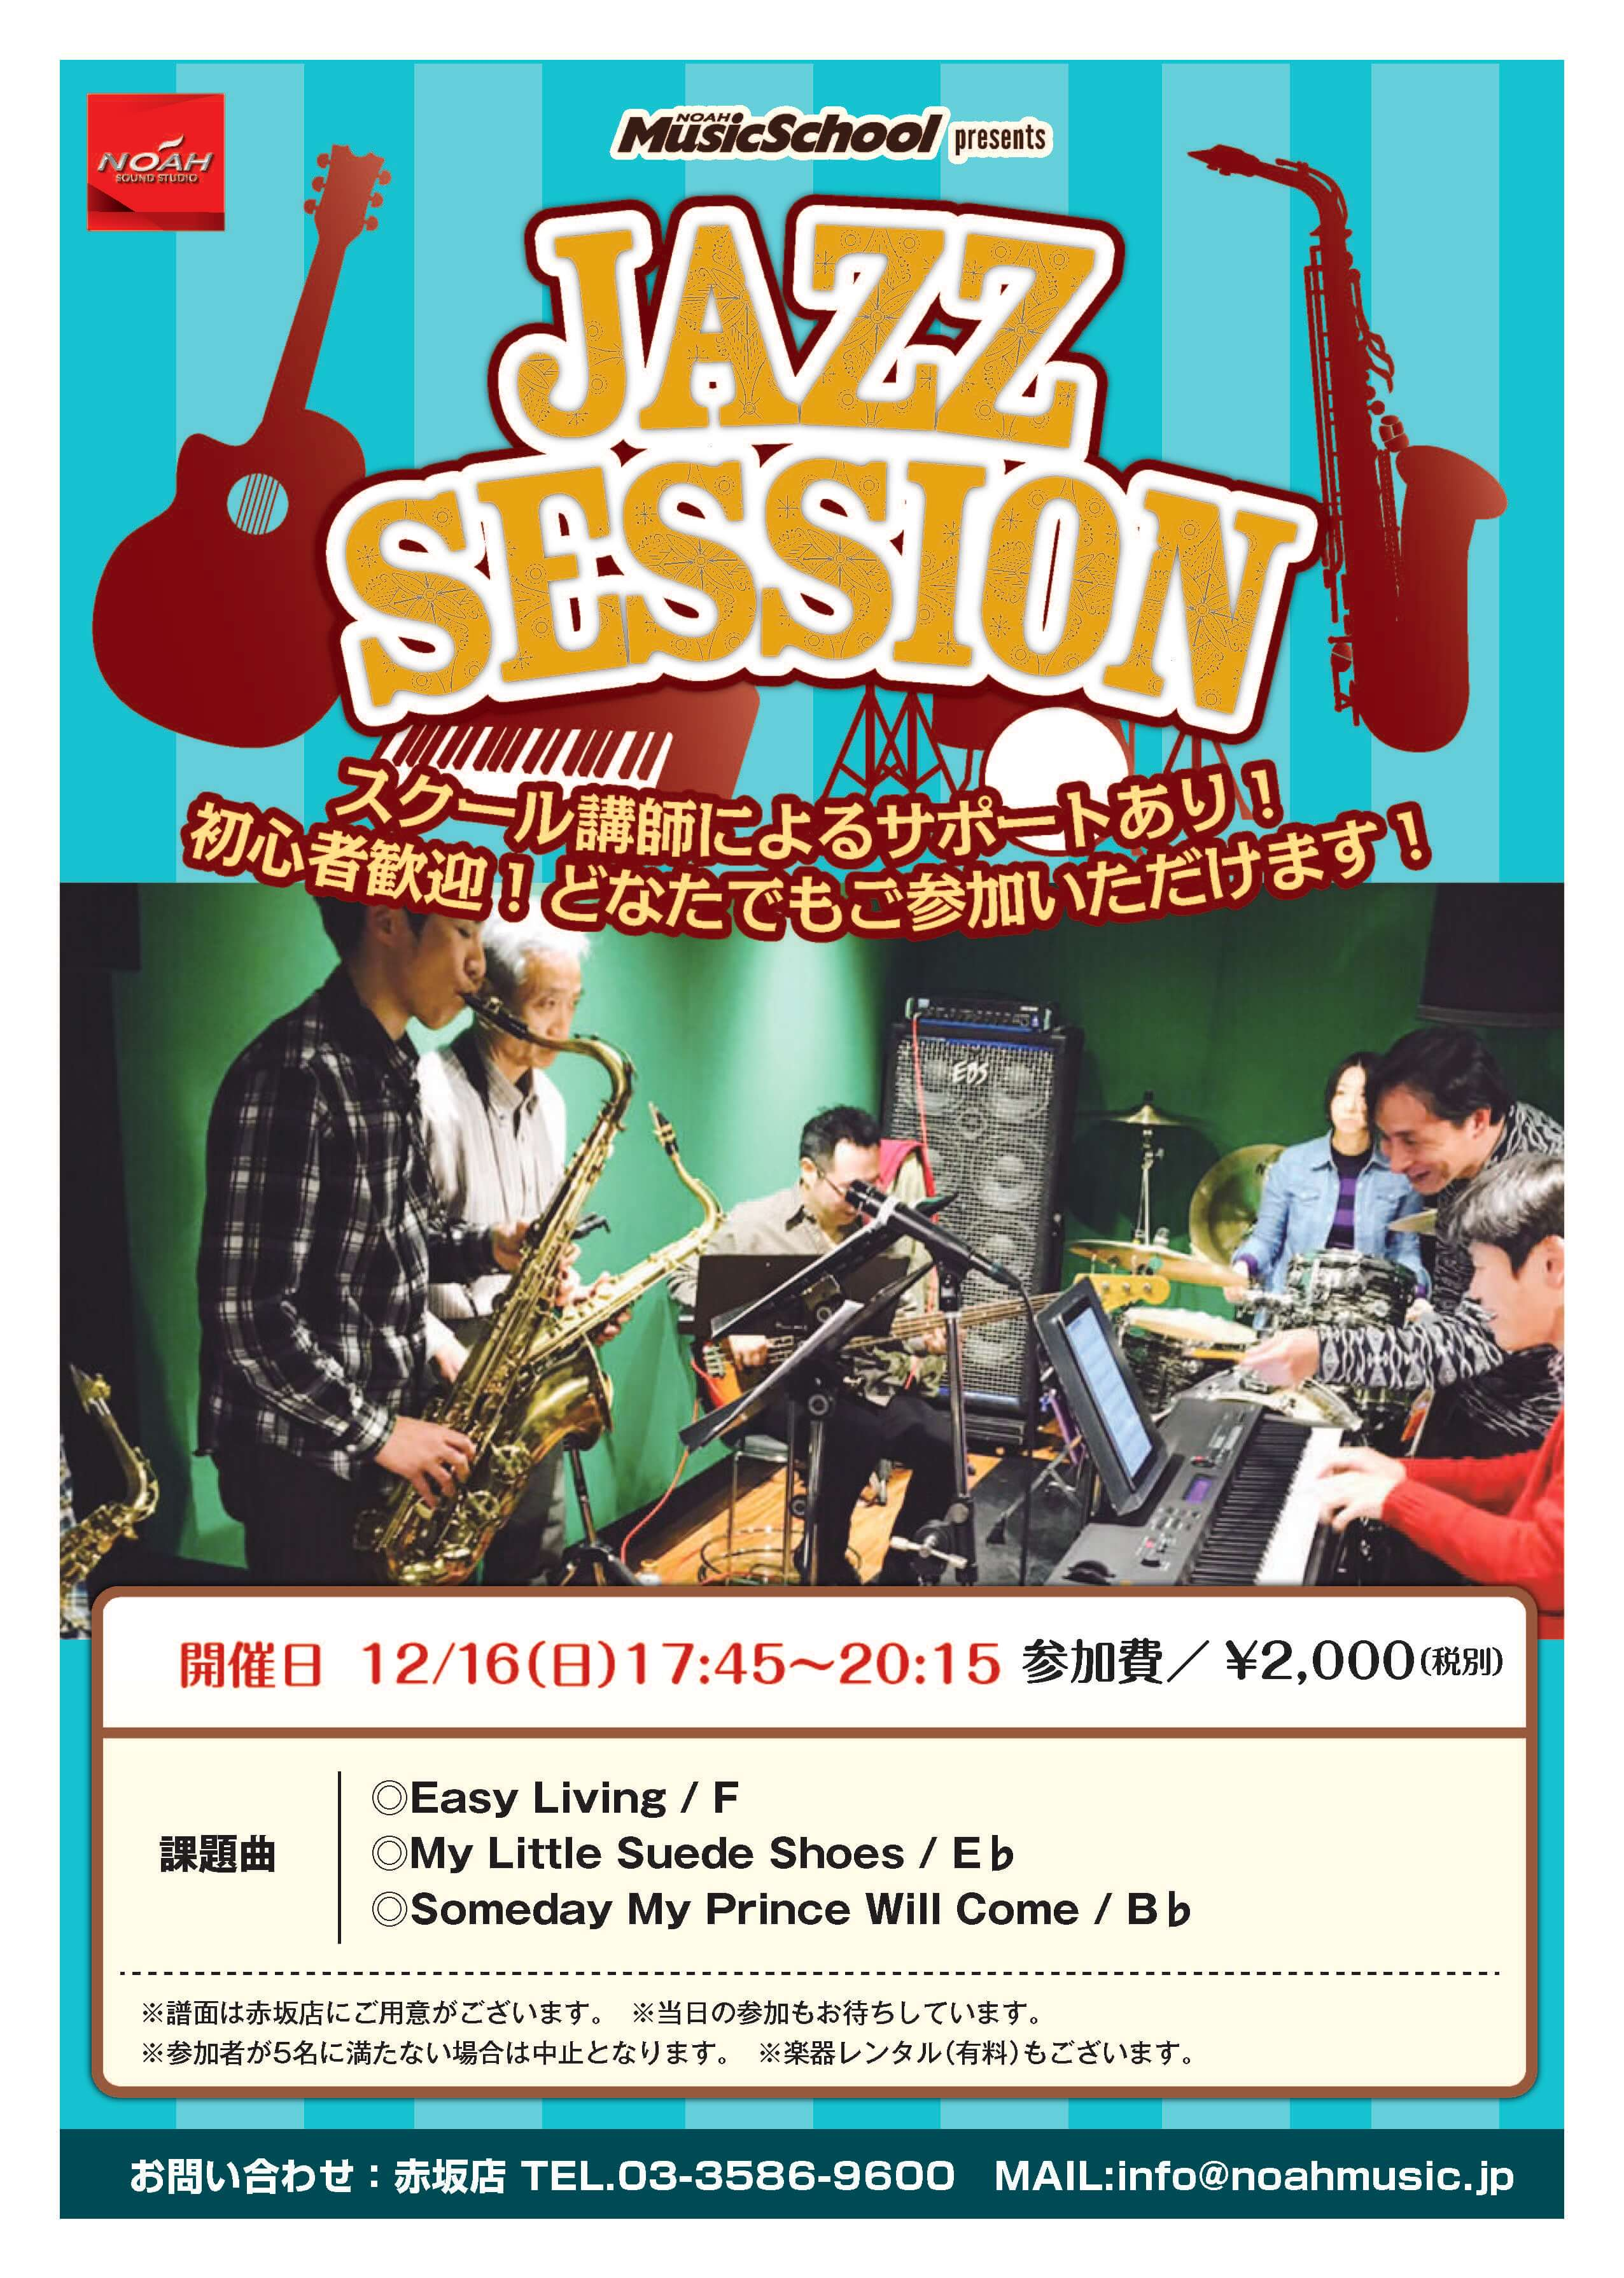 Music school presents  JAZZ SESSION 12/16開催!